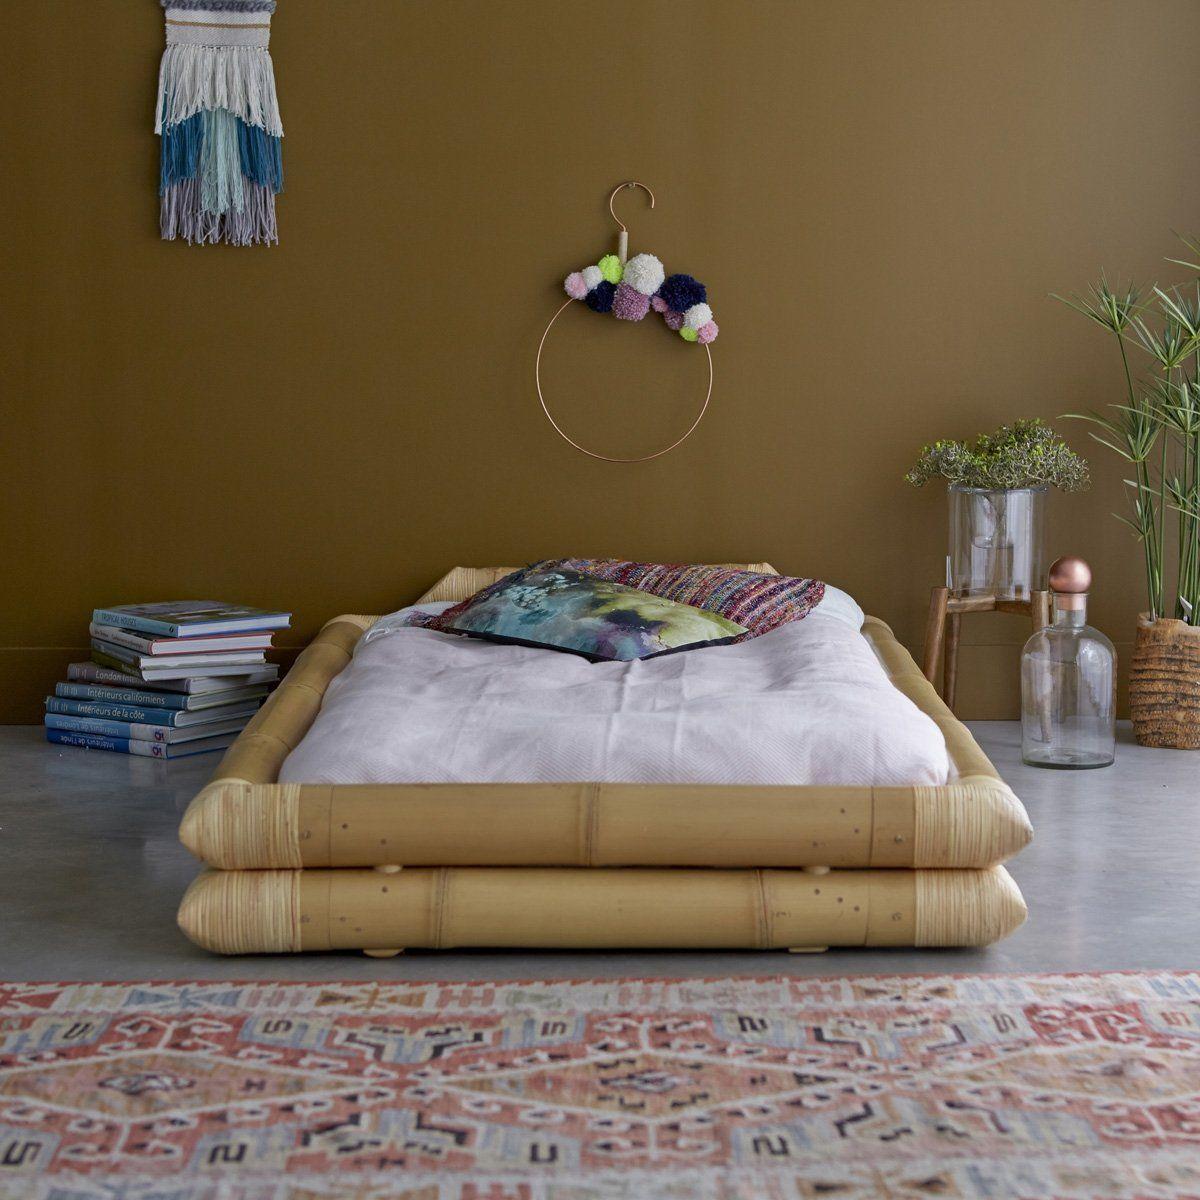 balyss bamboo futon bed frame for 90x190 balyss bamboo futon bed frame for 90x190   bamboo    pinterest      rh   pinterest